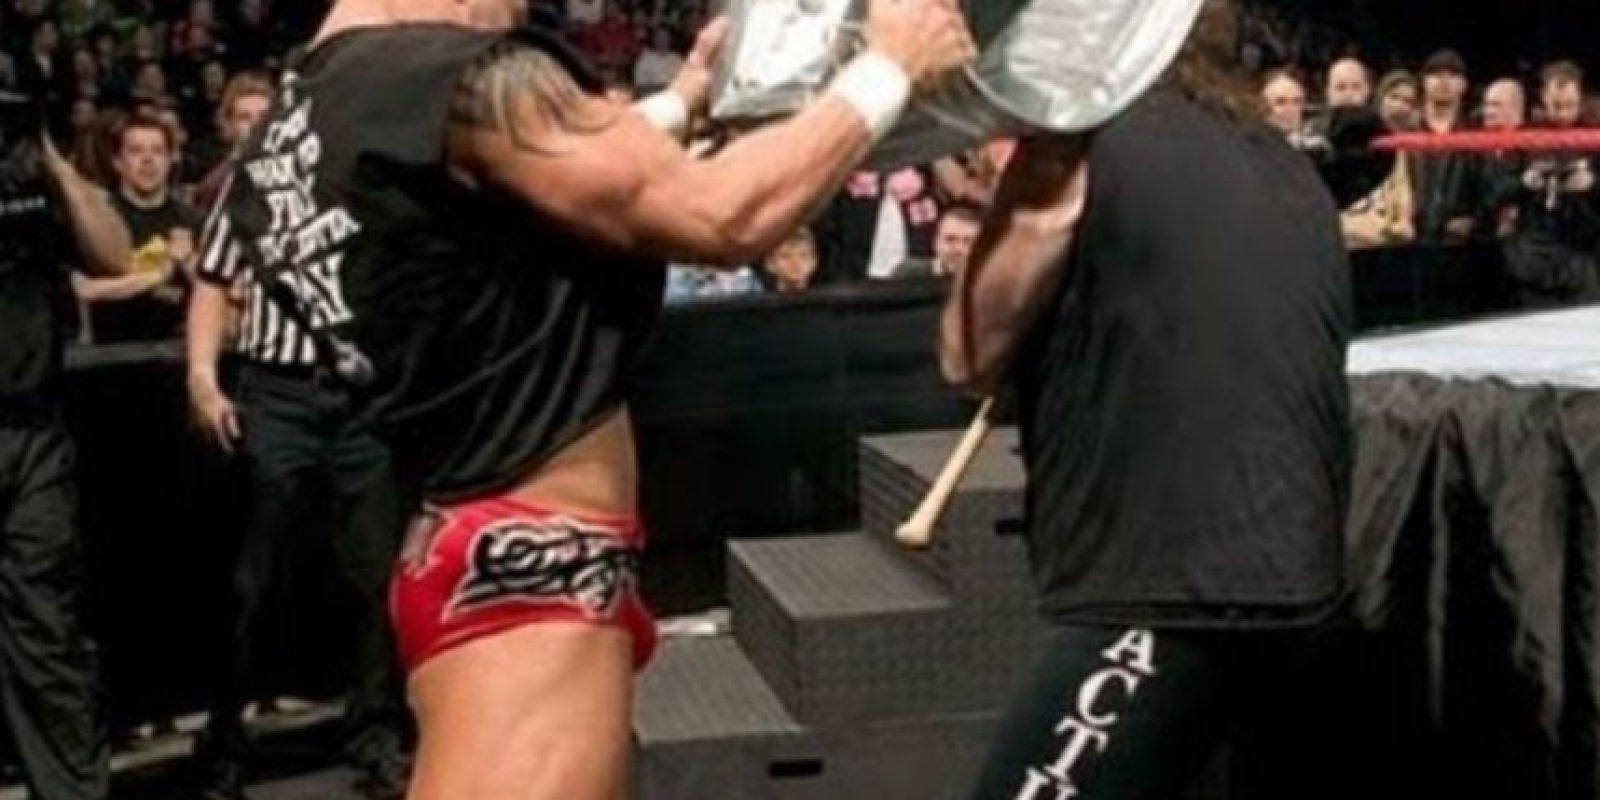 Randy Orton vs Mick Foley, en Backlash 2004. Foto:WWE